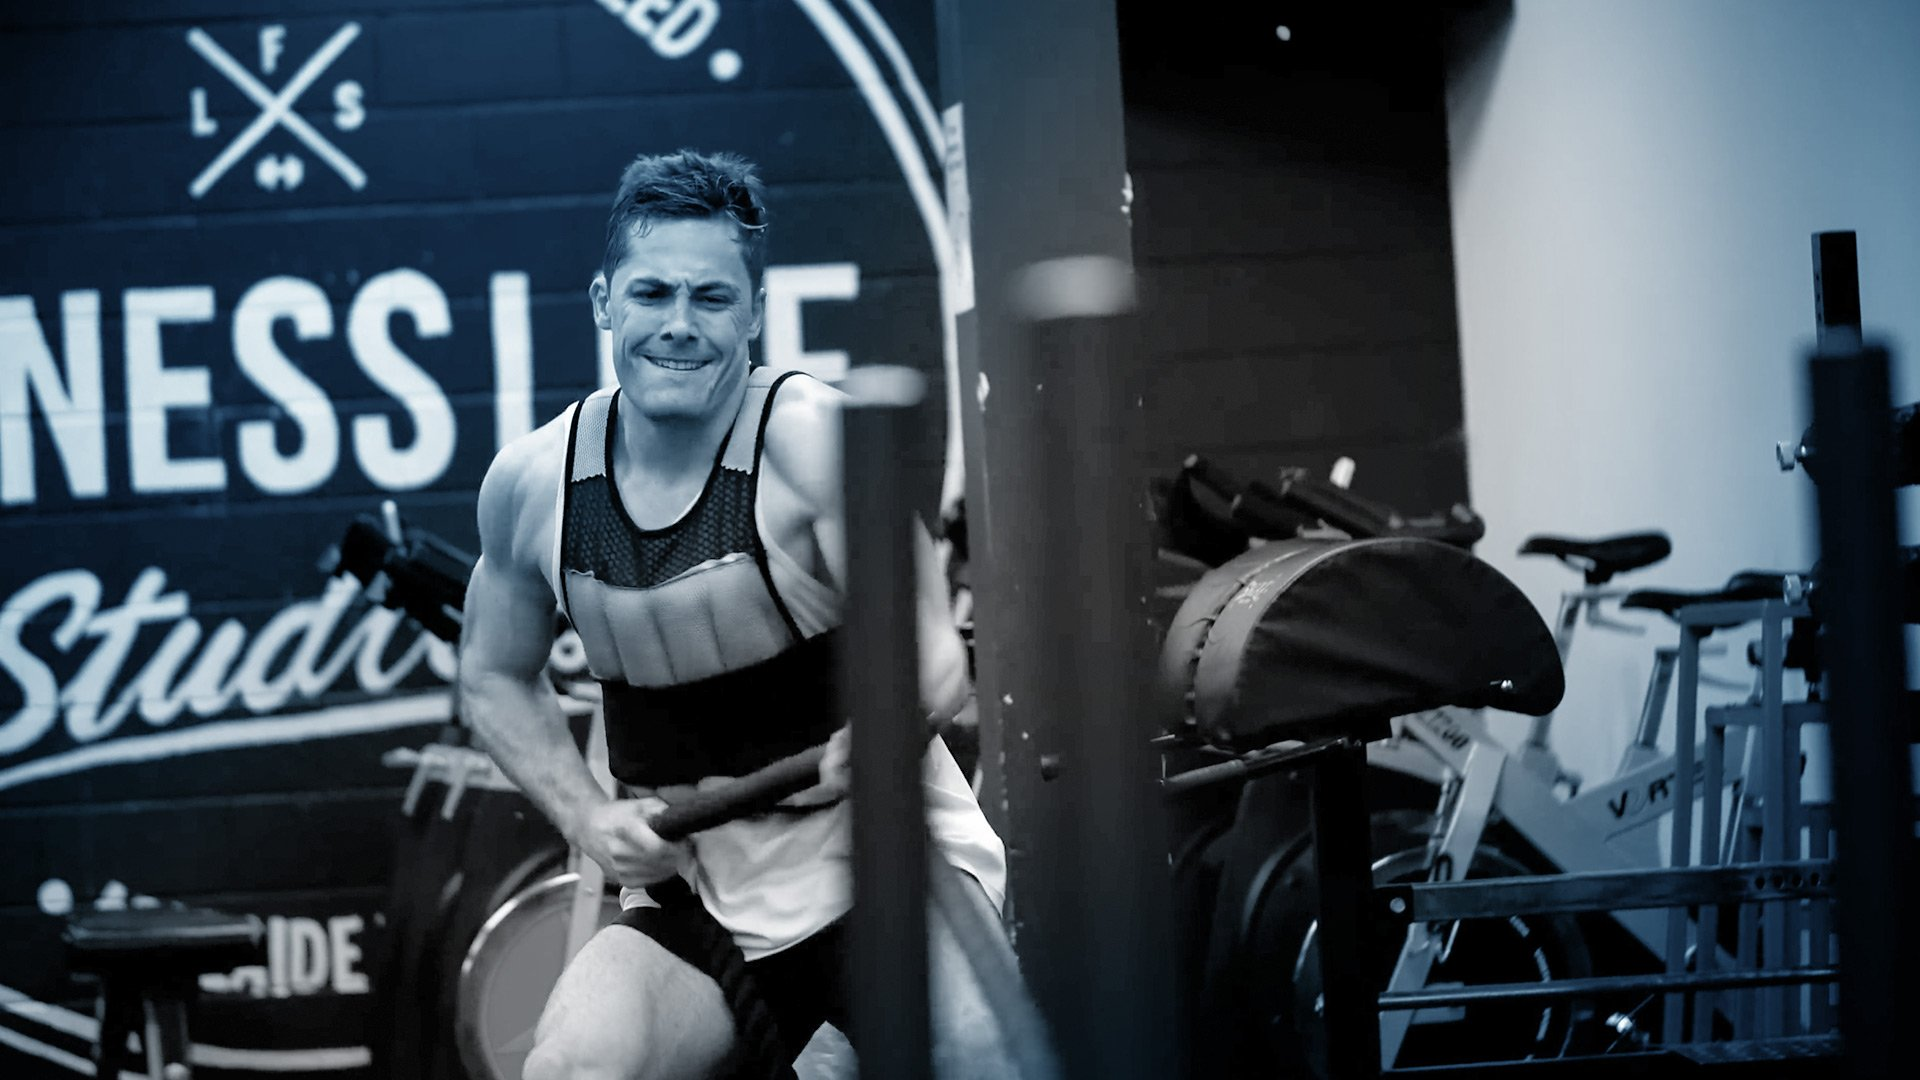 HIIT Fitness Life Studios